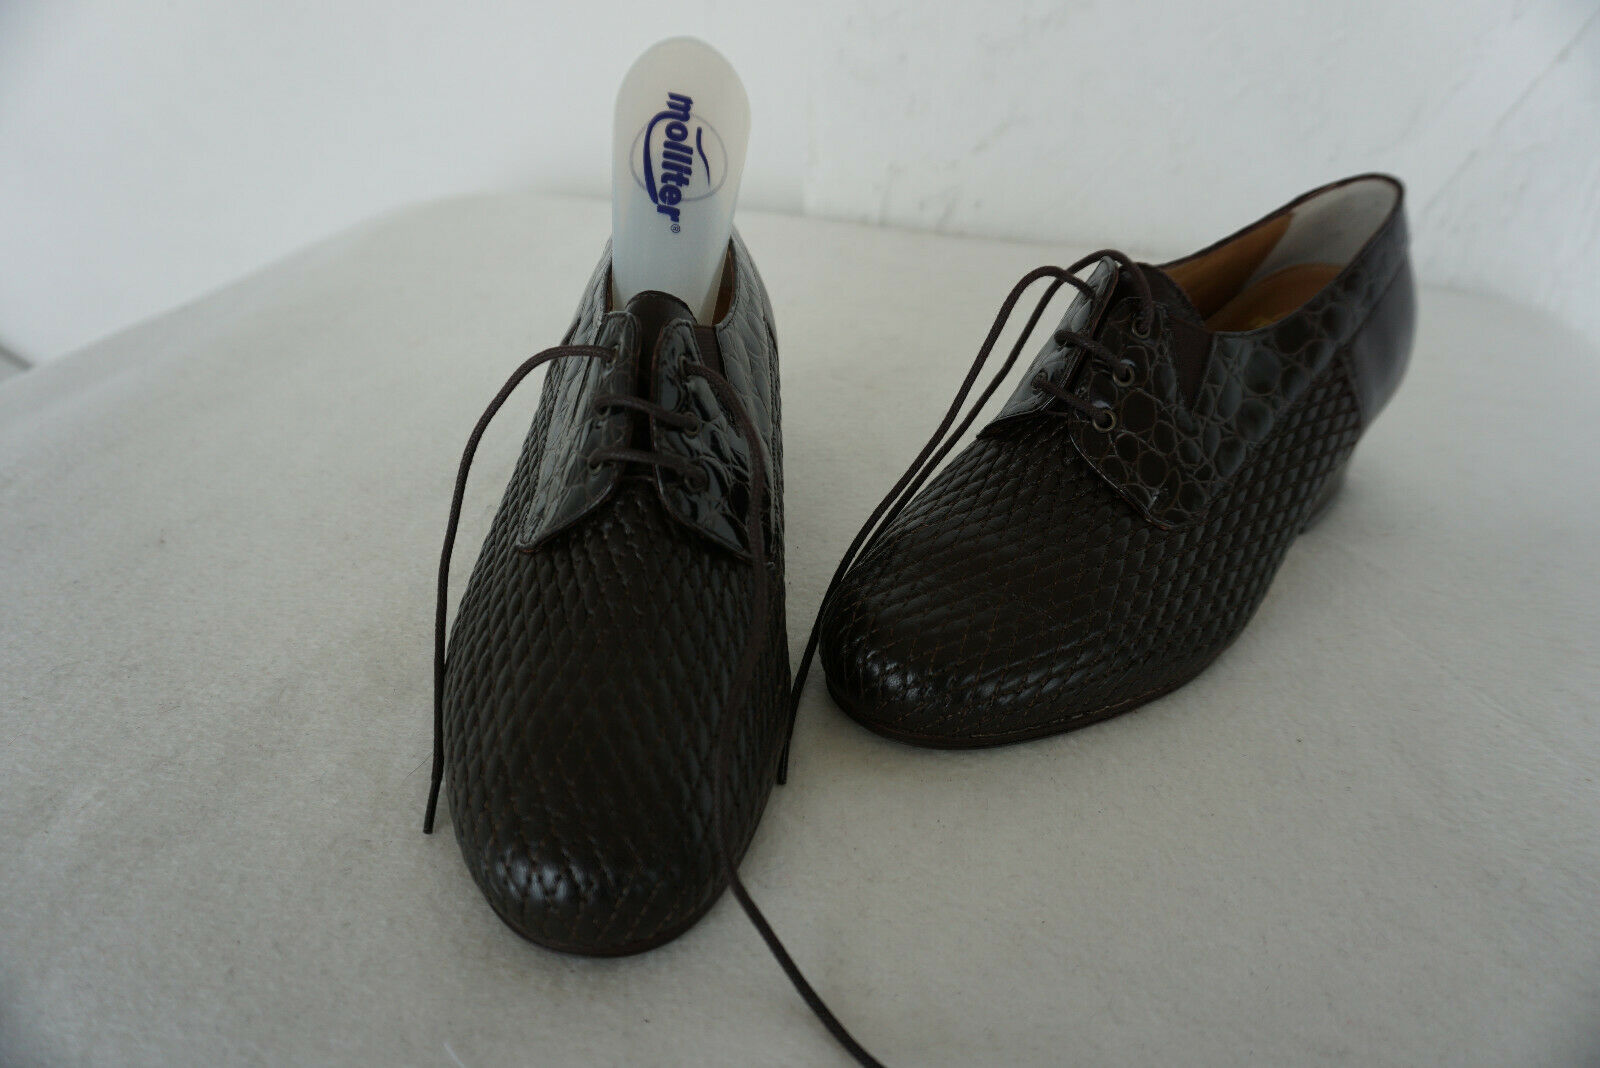 Orthopädische MOLLITER bequem Damen Comfort Schuhe Gr.34 schwarz Lack Leder NEU